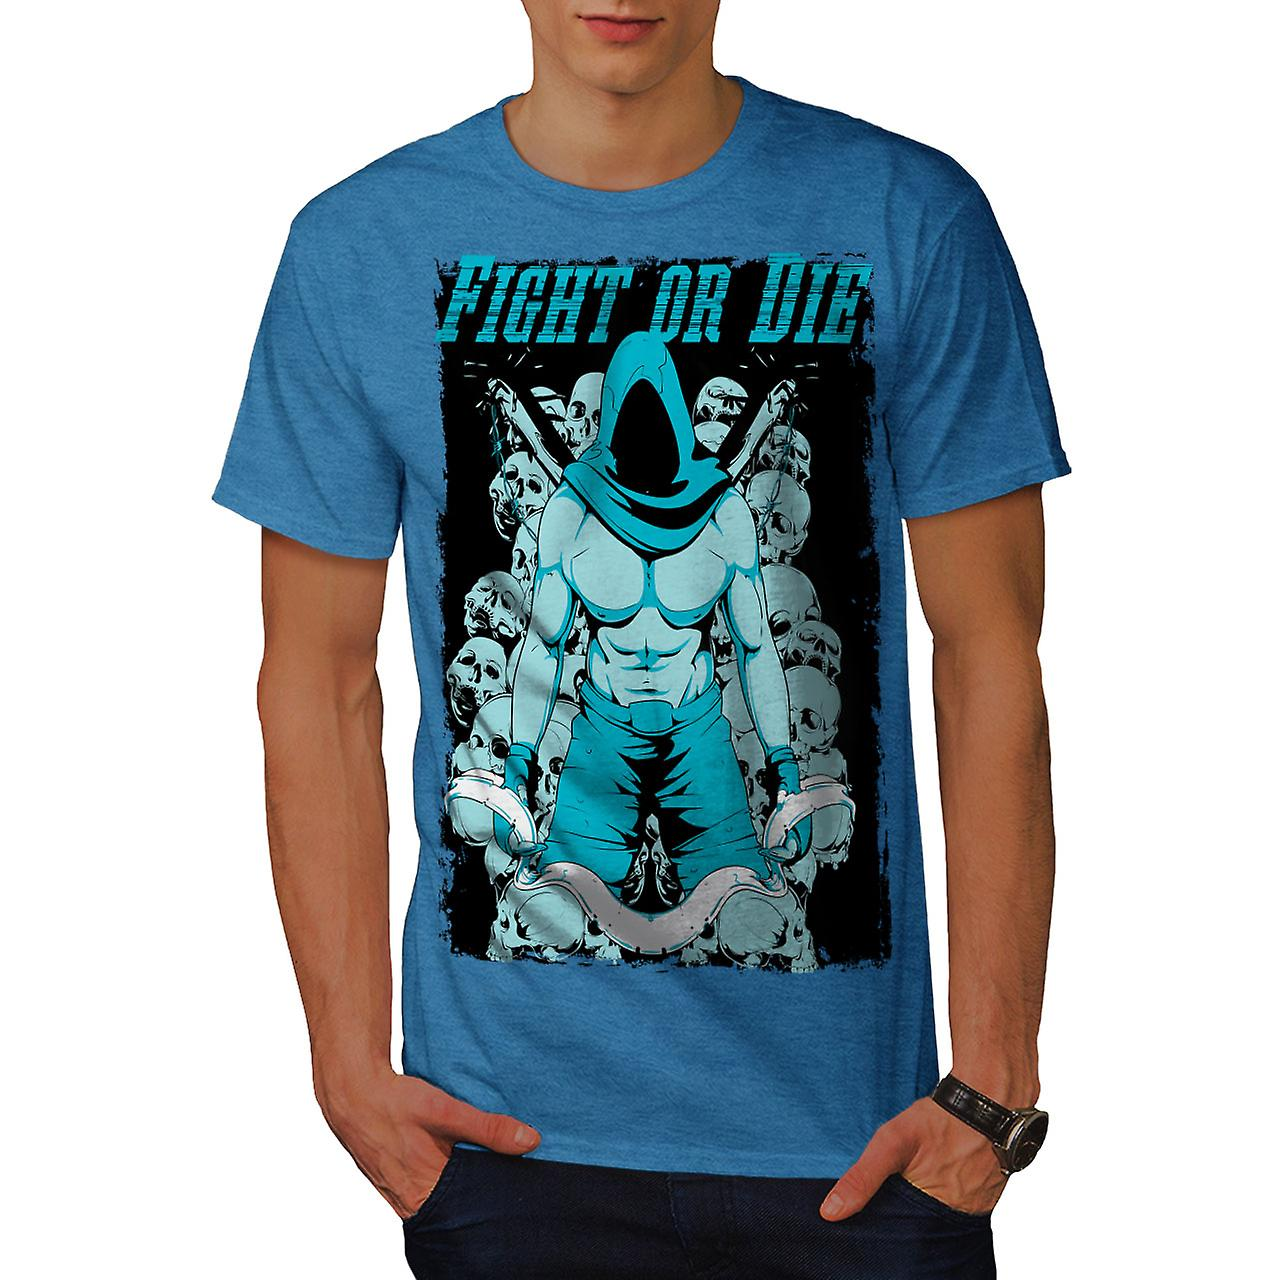 fight or die it is a